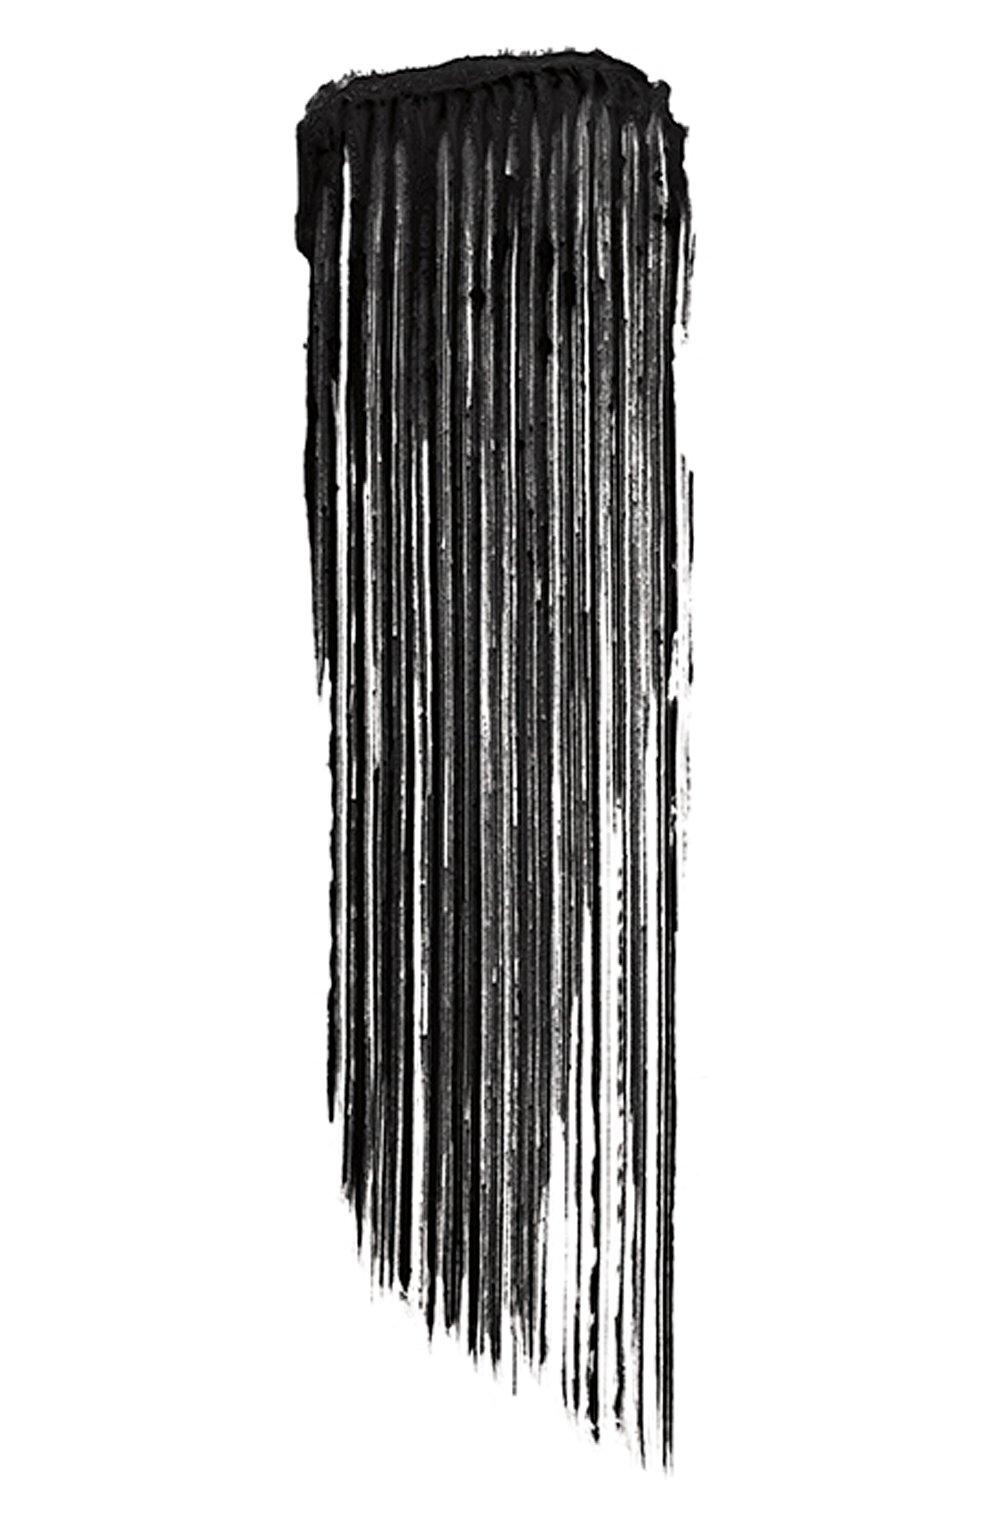 Тушь ControlledChaos MascaraInk, оттенок 01 Black Pulse Shiseido | Фото №2